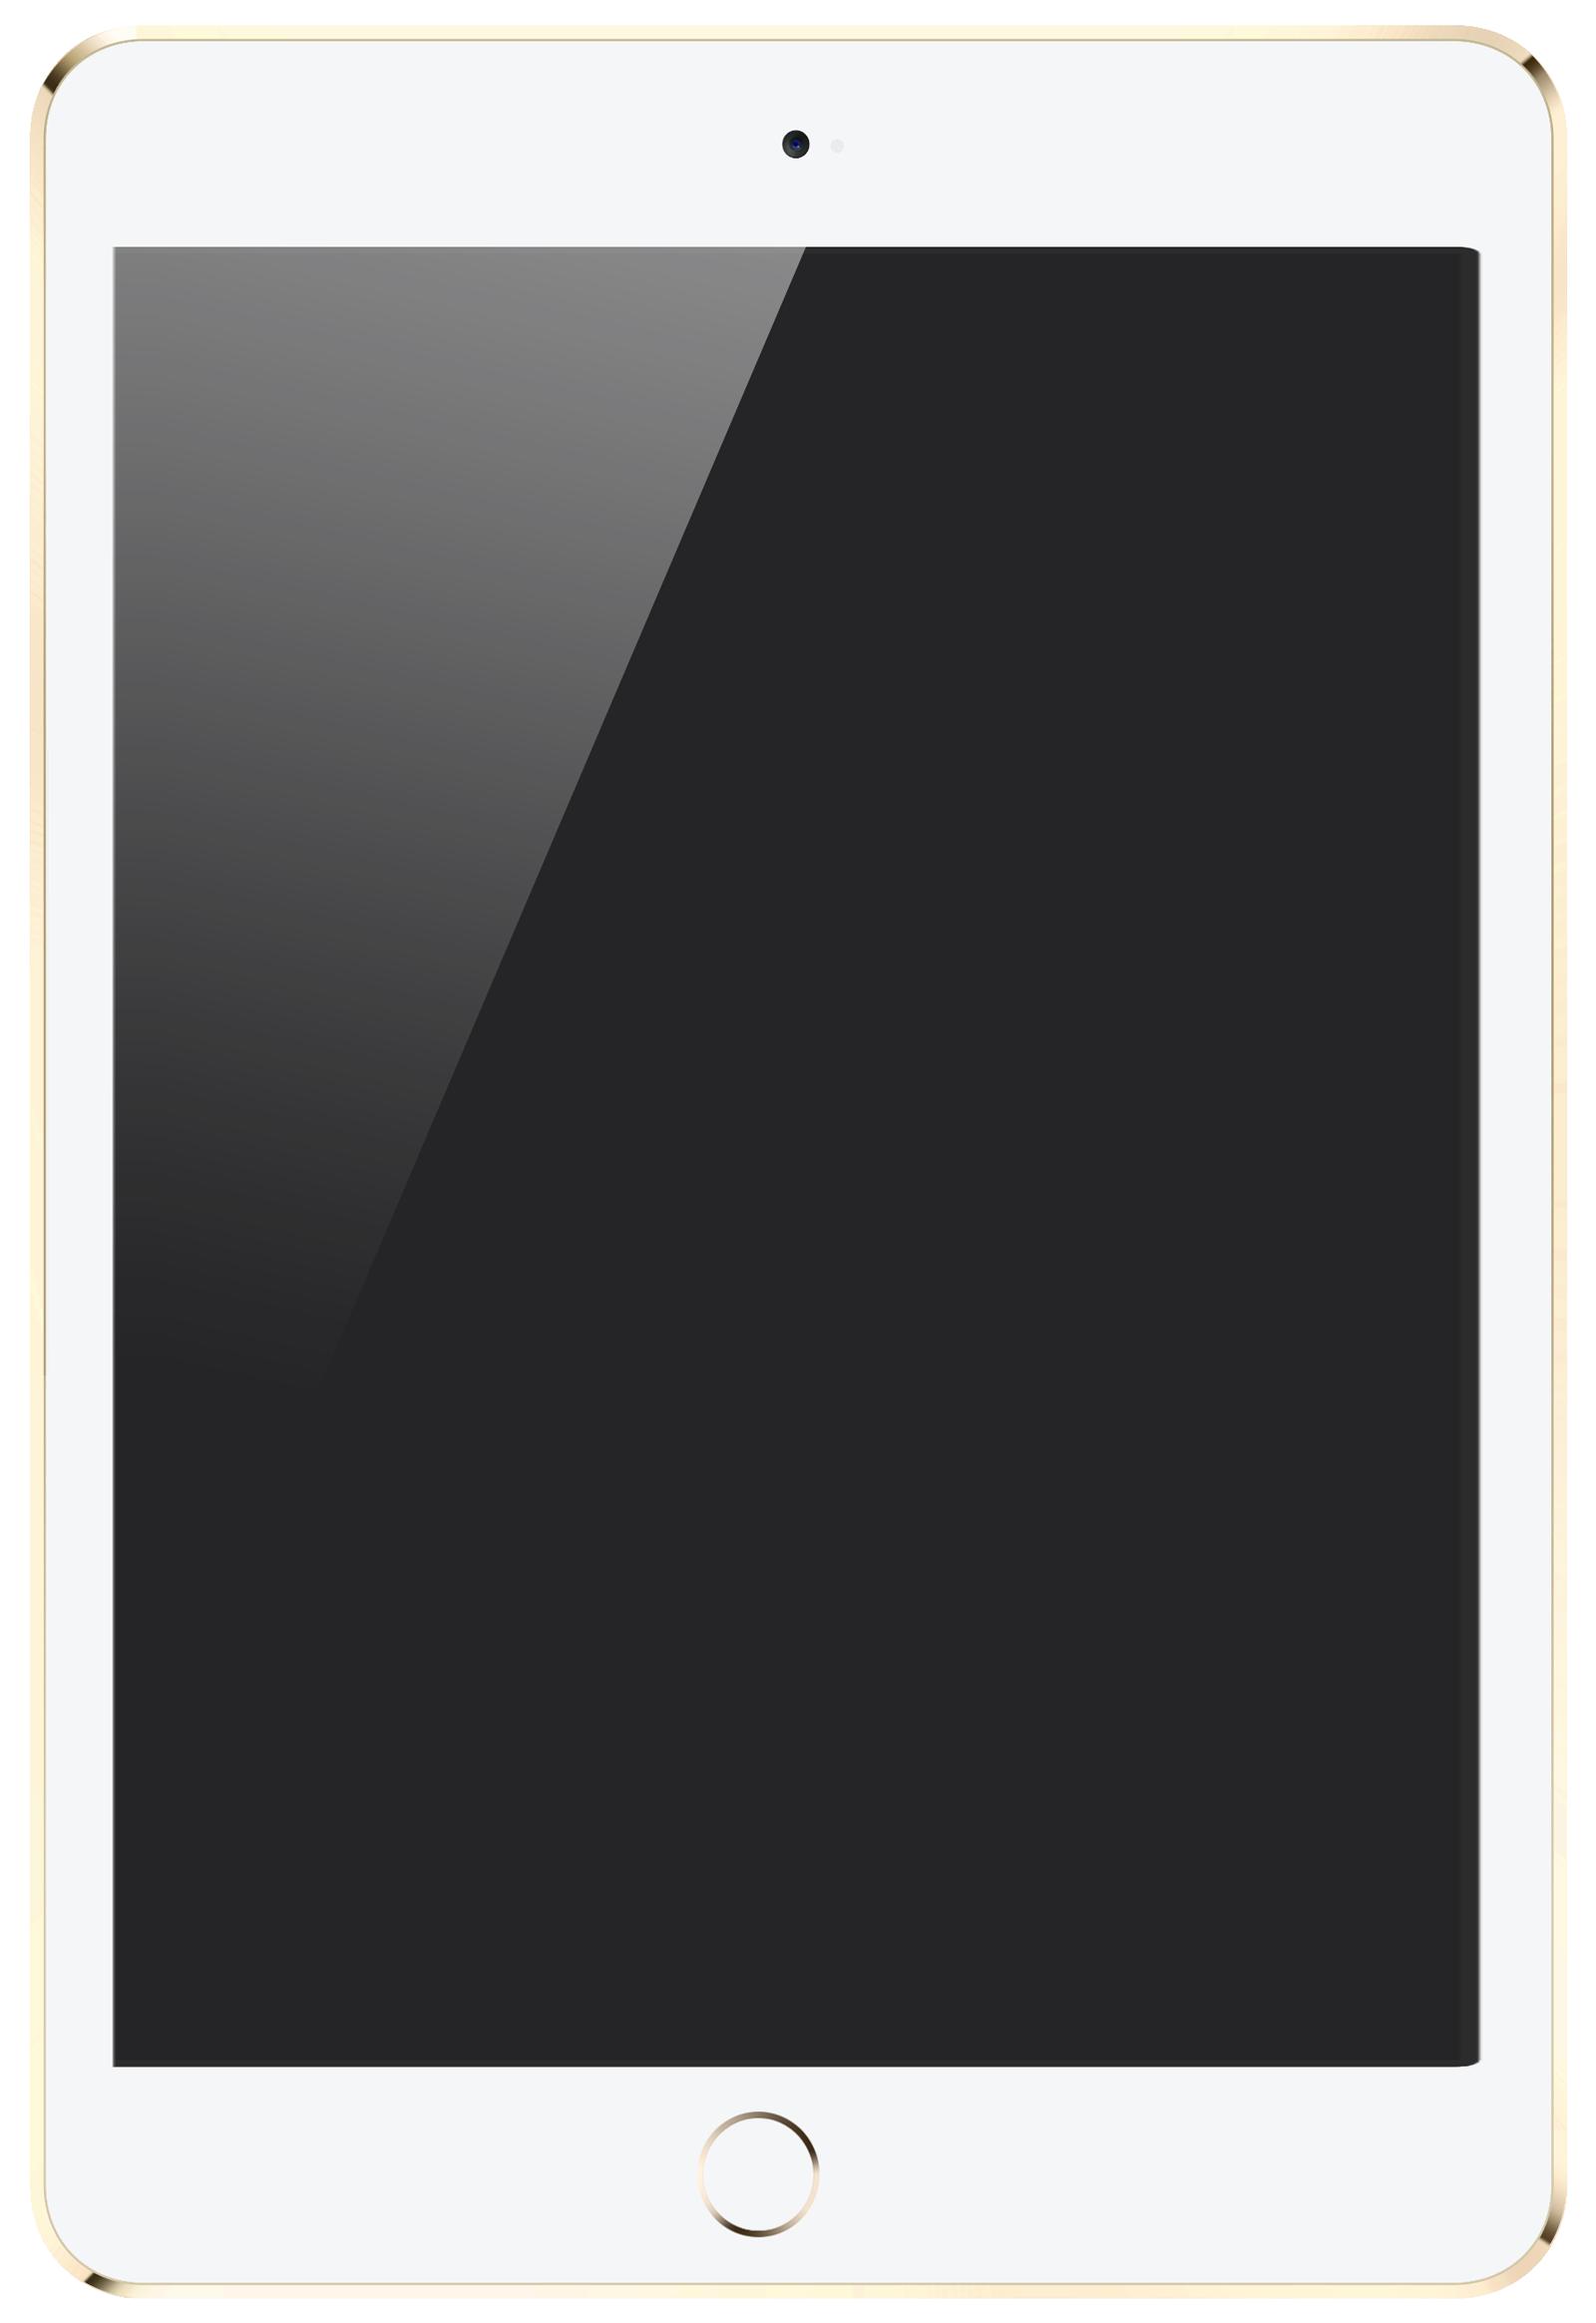 IPad Air Tablet PNG Image